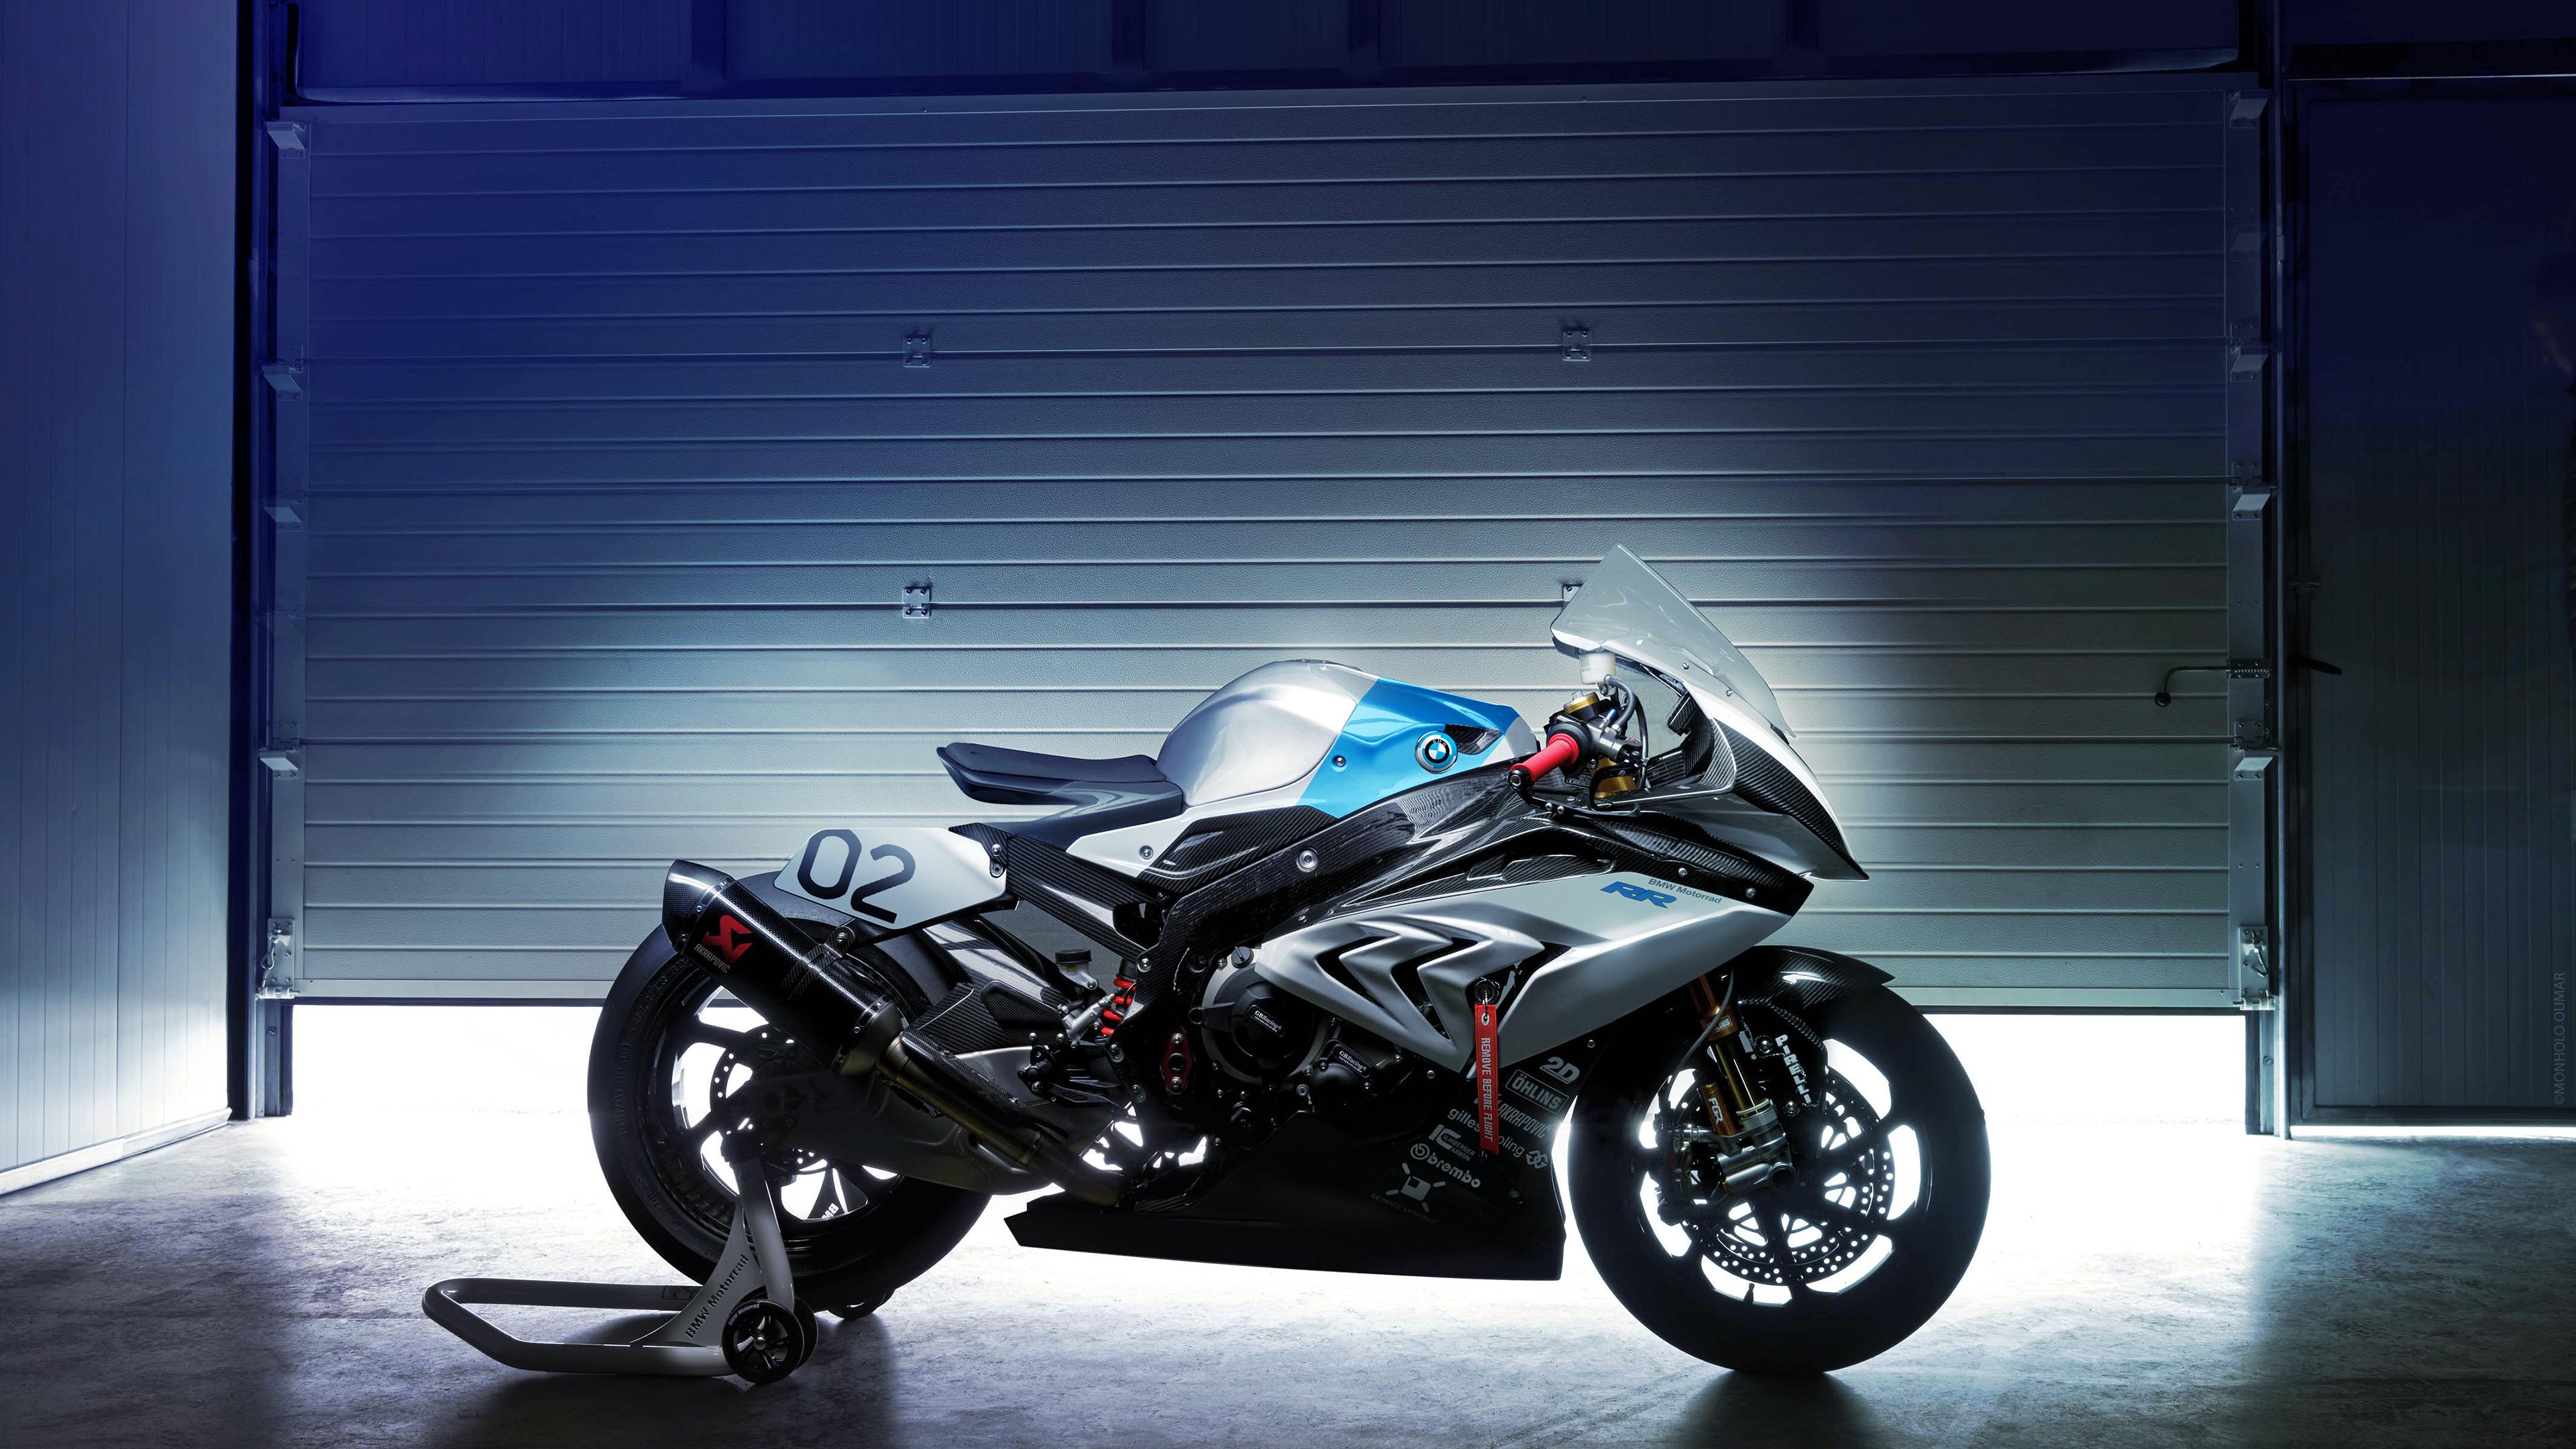 bmw motorrad 4k 2018 1541295679 - BMW Motorrad 4k 2018 - hd-wallpapers, bmw wallpapers, bikes wallpapers, behance wallpapers, 4k-wallpapers